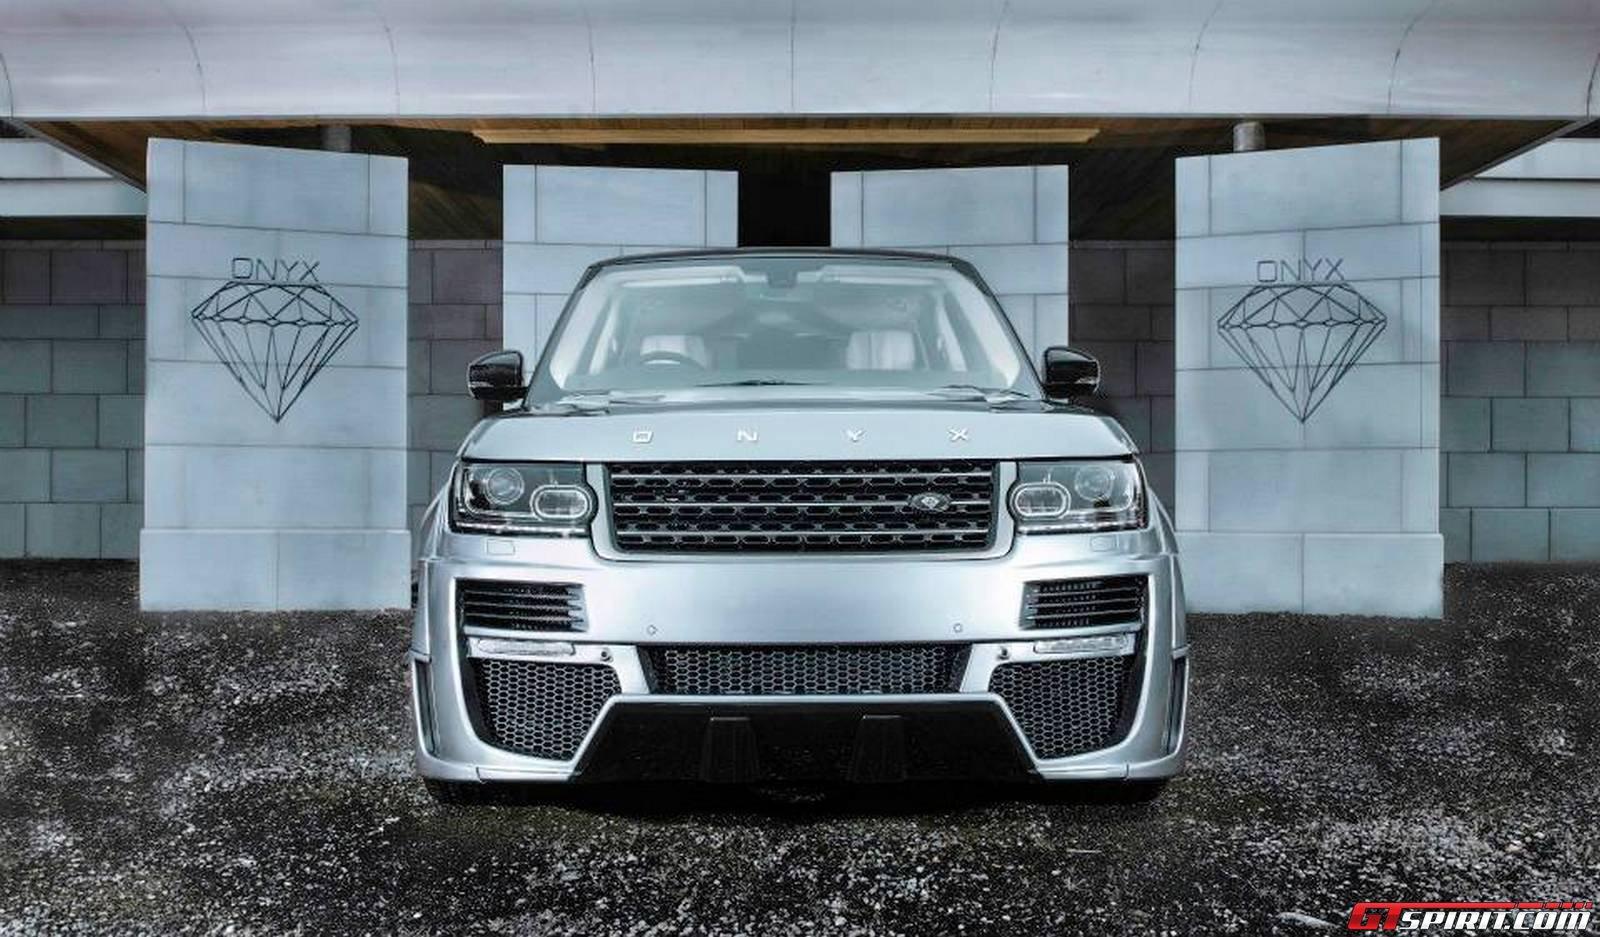 http://www.gtspirit.com/wp-content/gallery/range-rover-aspen-ultimate-series/range-rover-aspen-ultimate-series-6.jpg